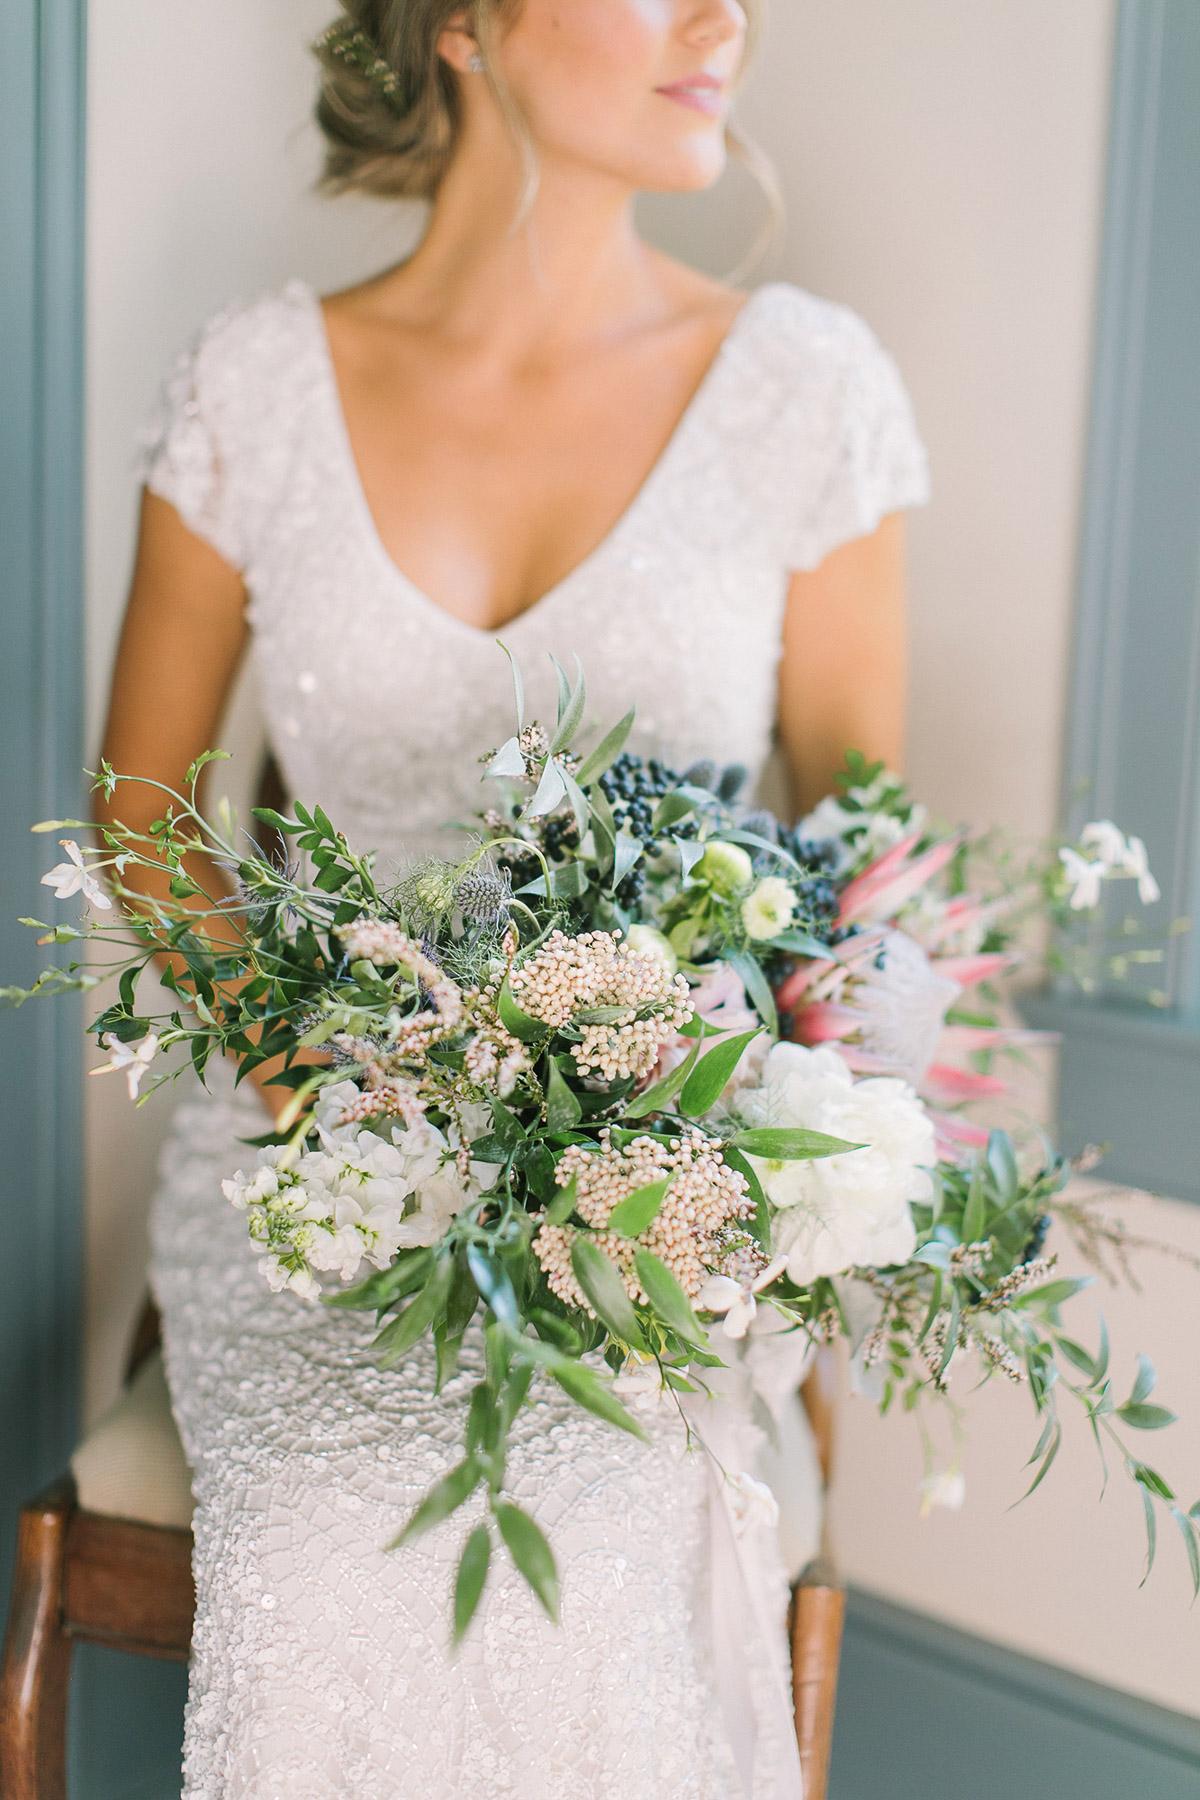 elizabeth-in-love-vineyard-bride-swish-list-cherry-avenue-farms-vineland-wedding-23.jpg